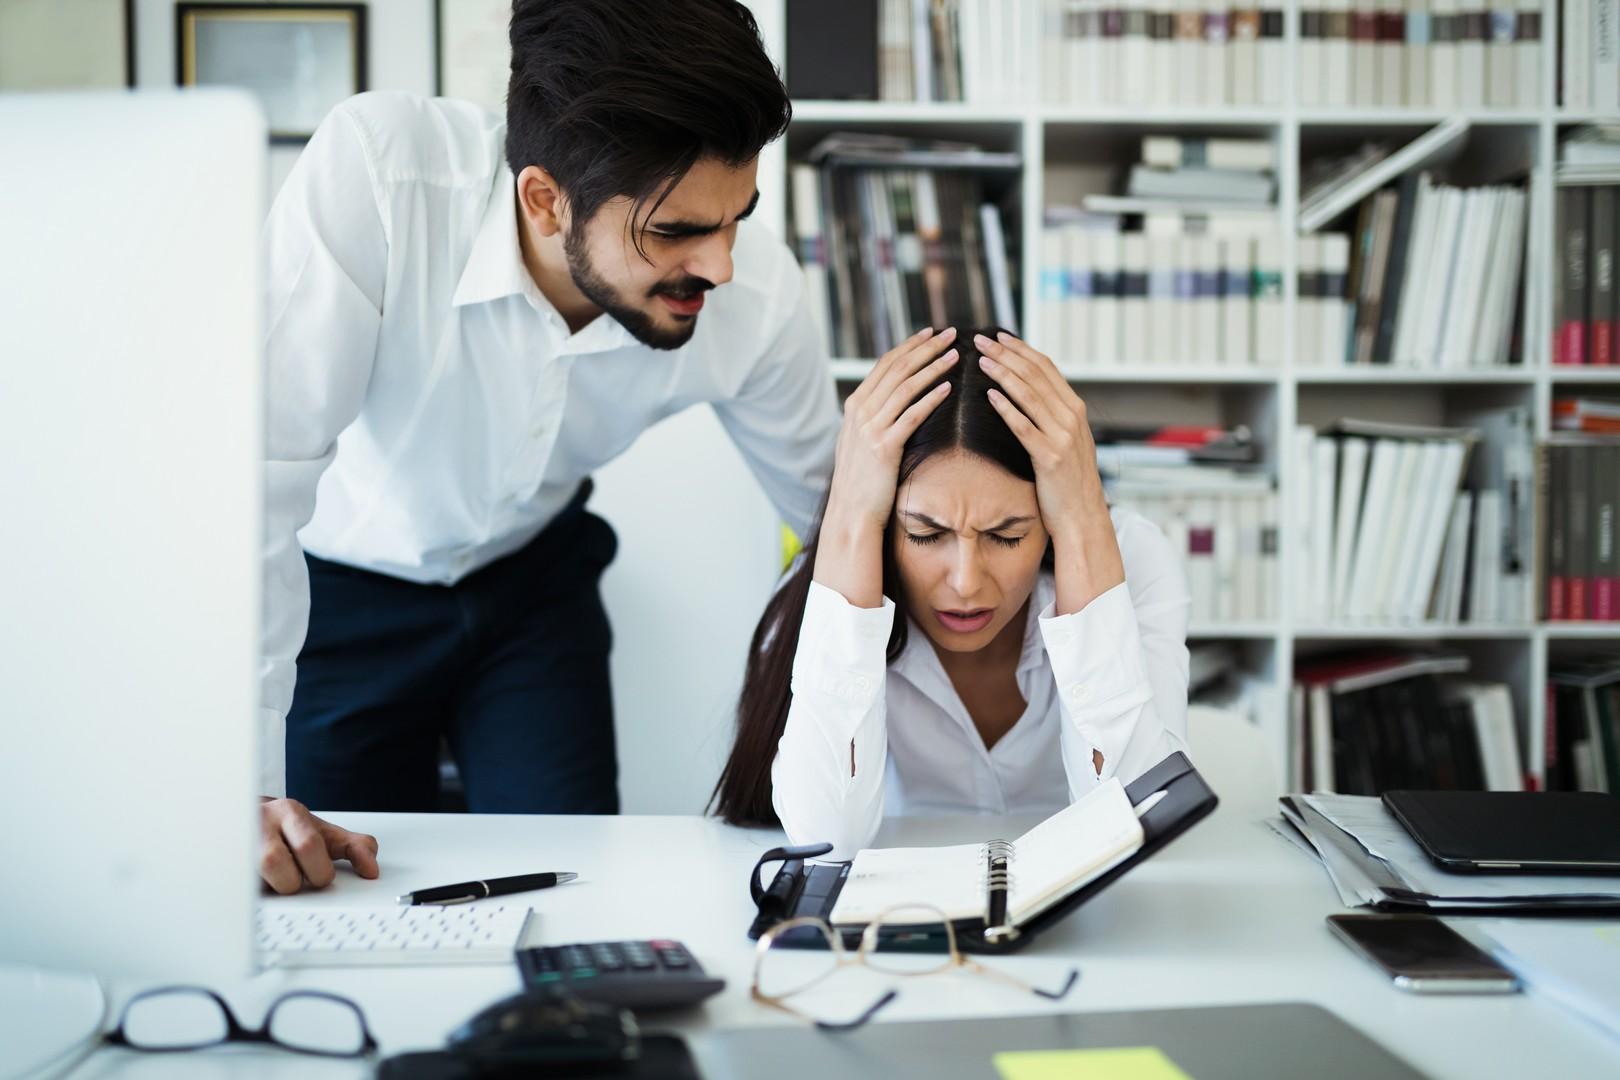 tn Komunikacja i stres w obsłudze interesanta